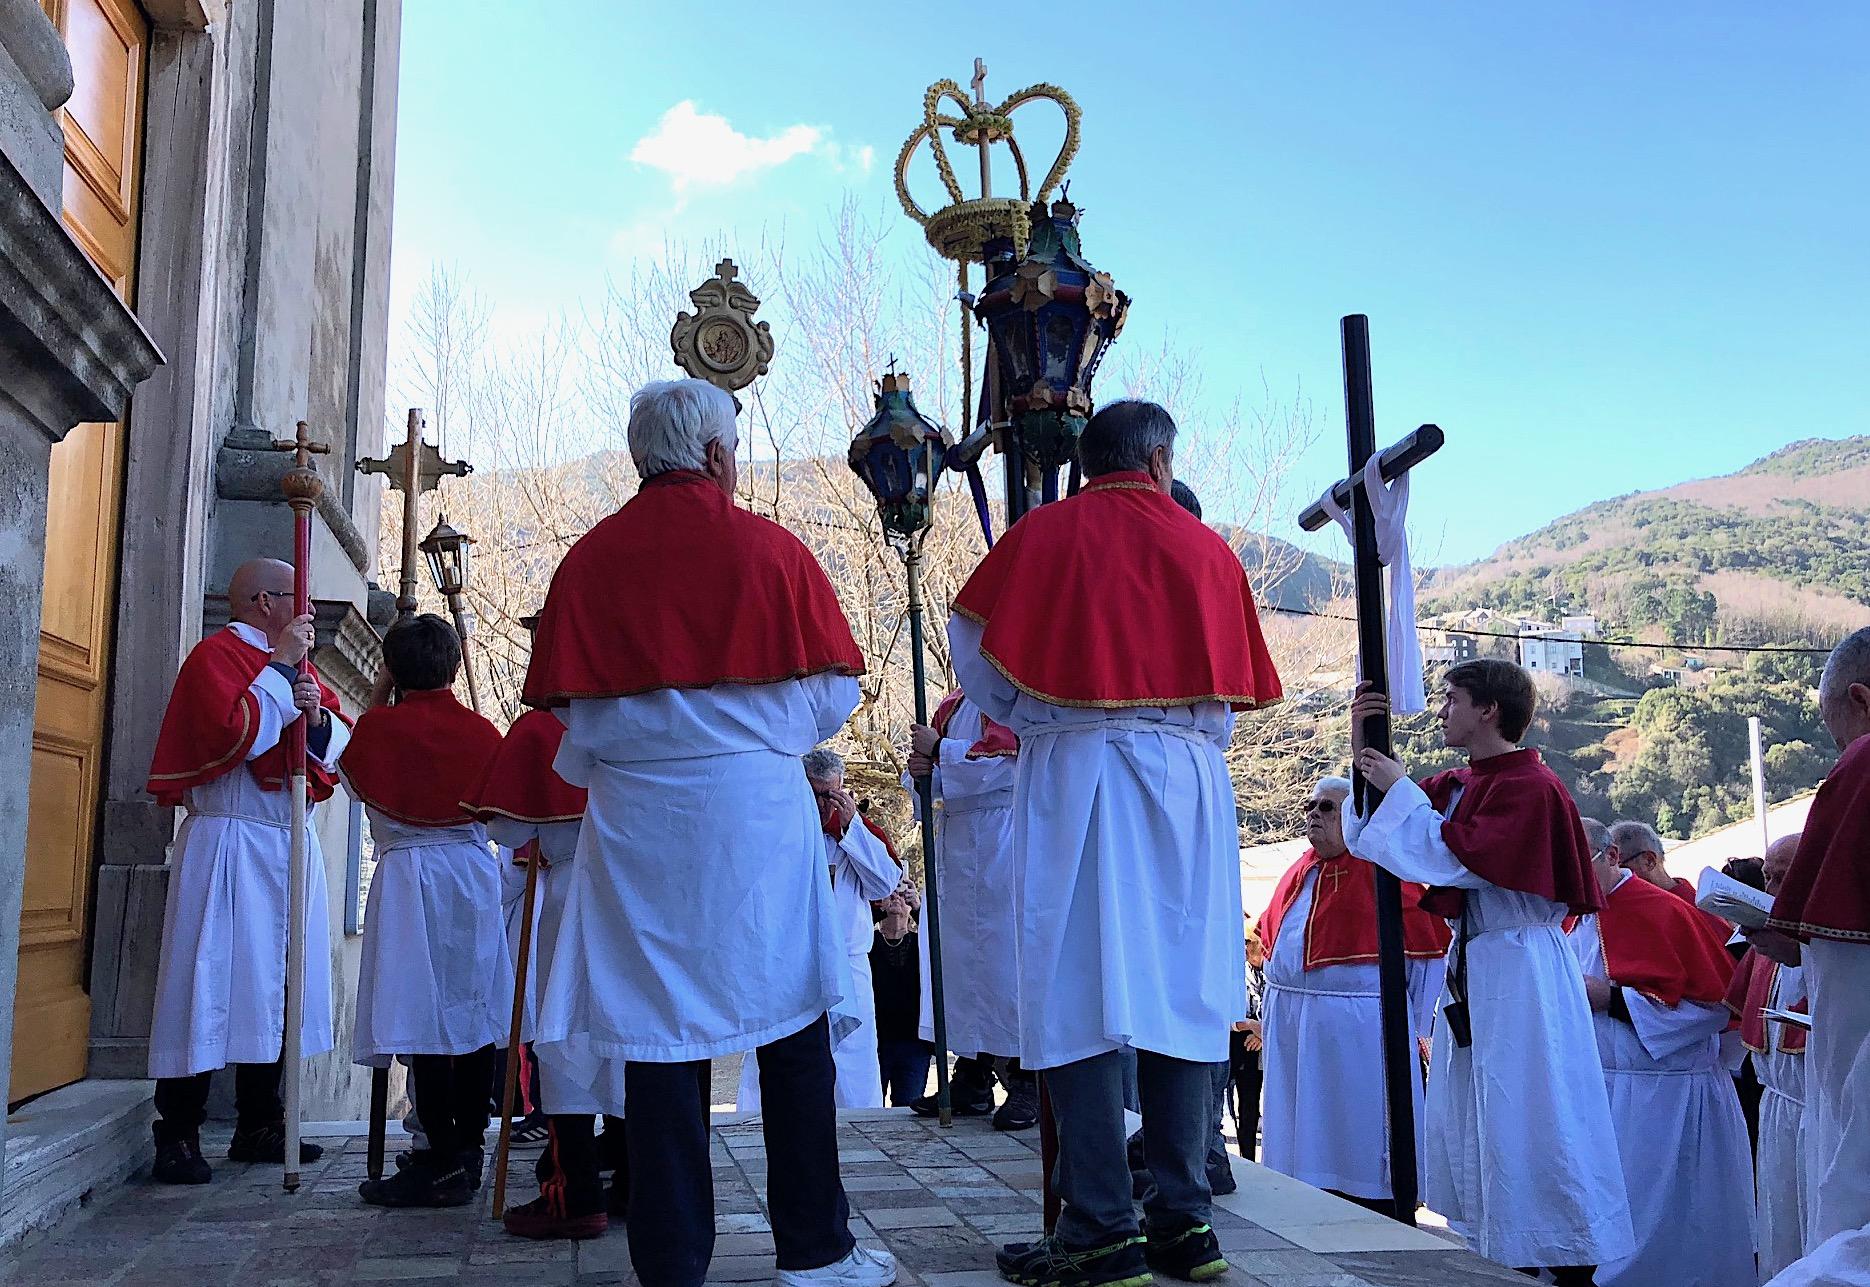 La procession de la Pulezulla dans la vallée de Lota